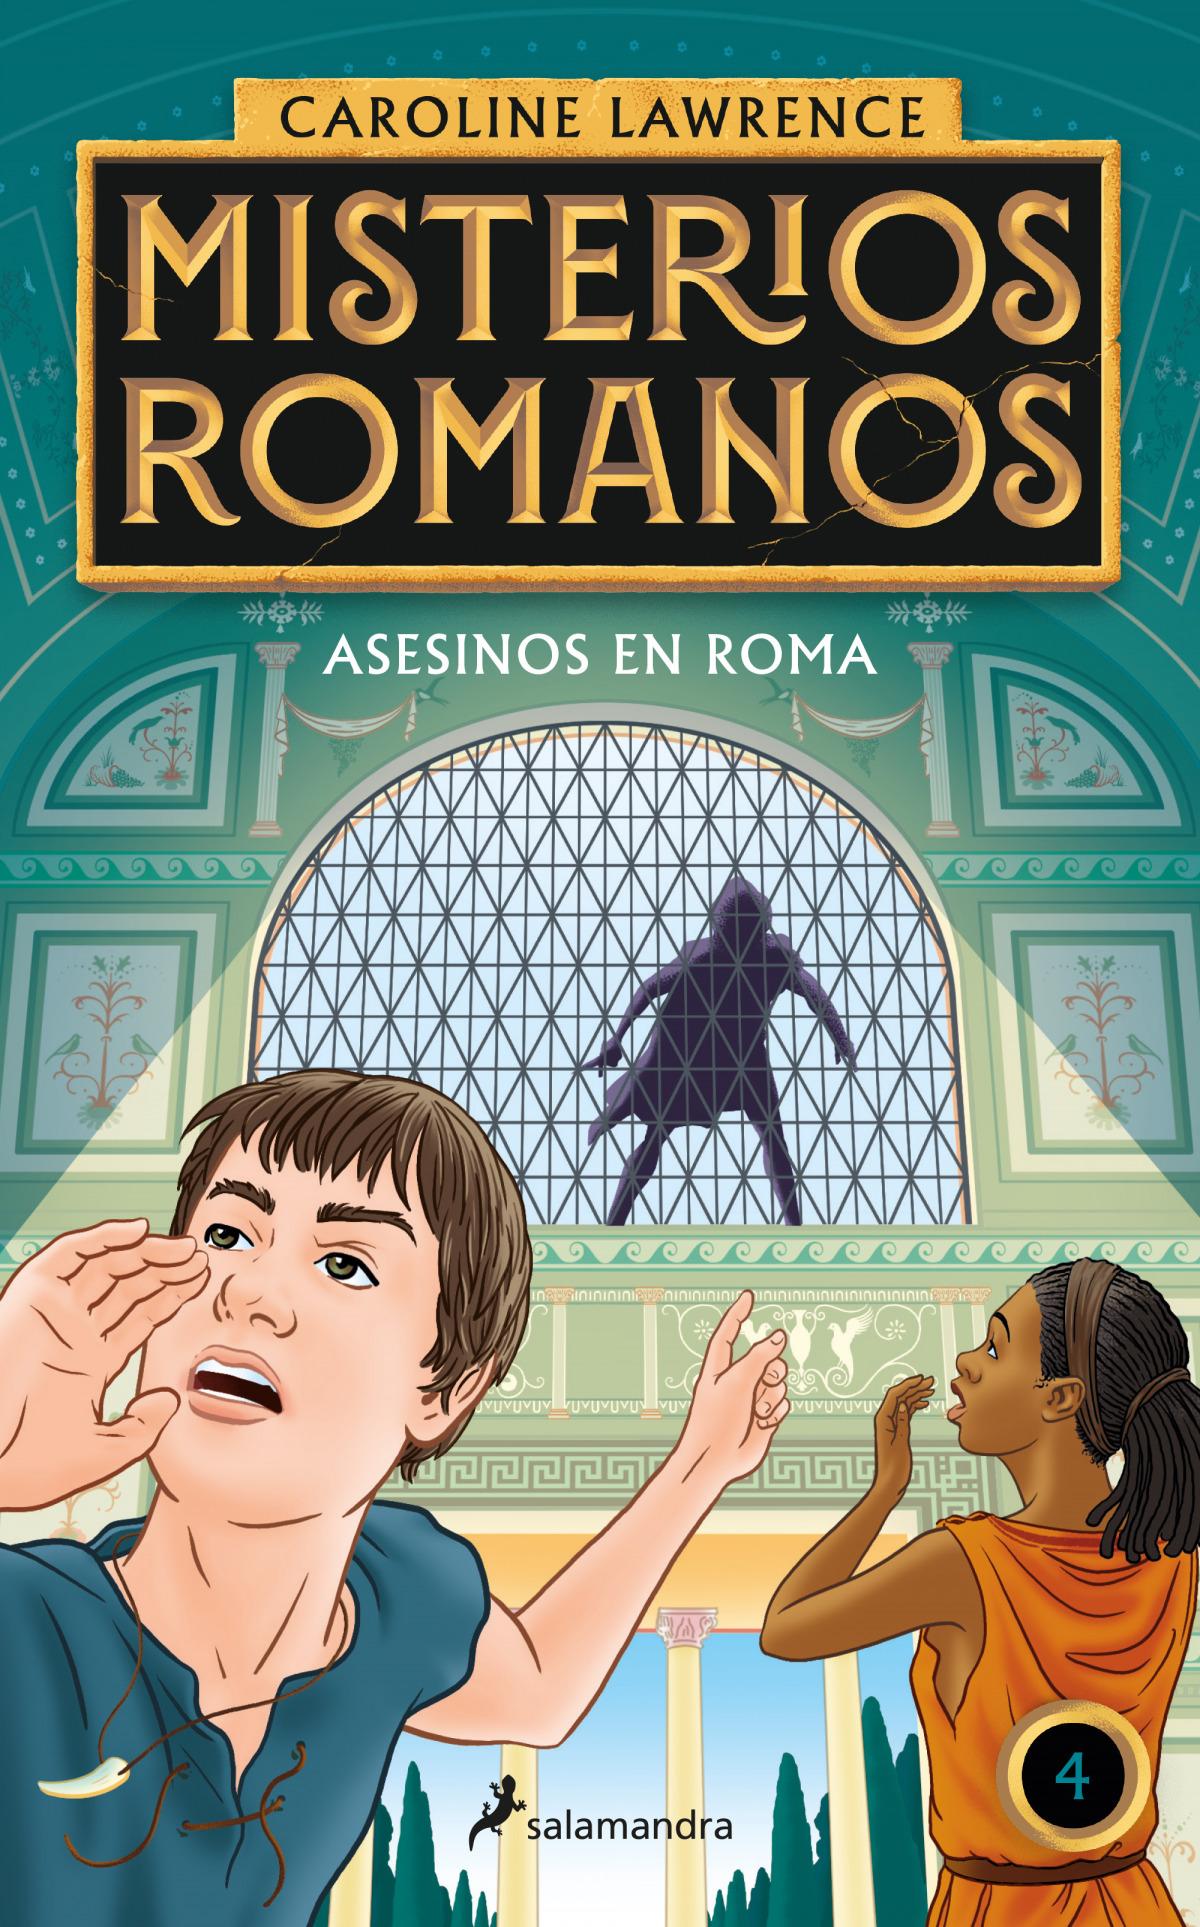 Asesinos en Roma (Misterios romanos 4)